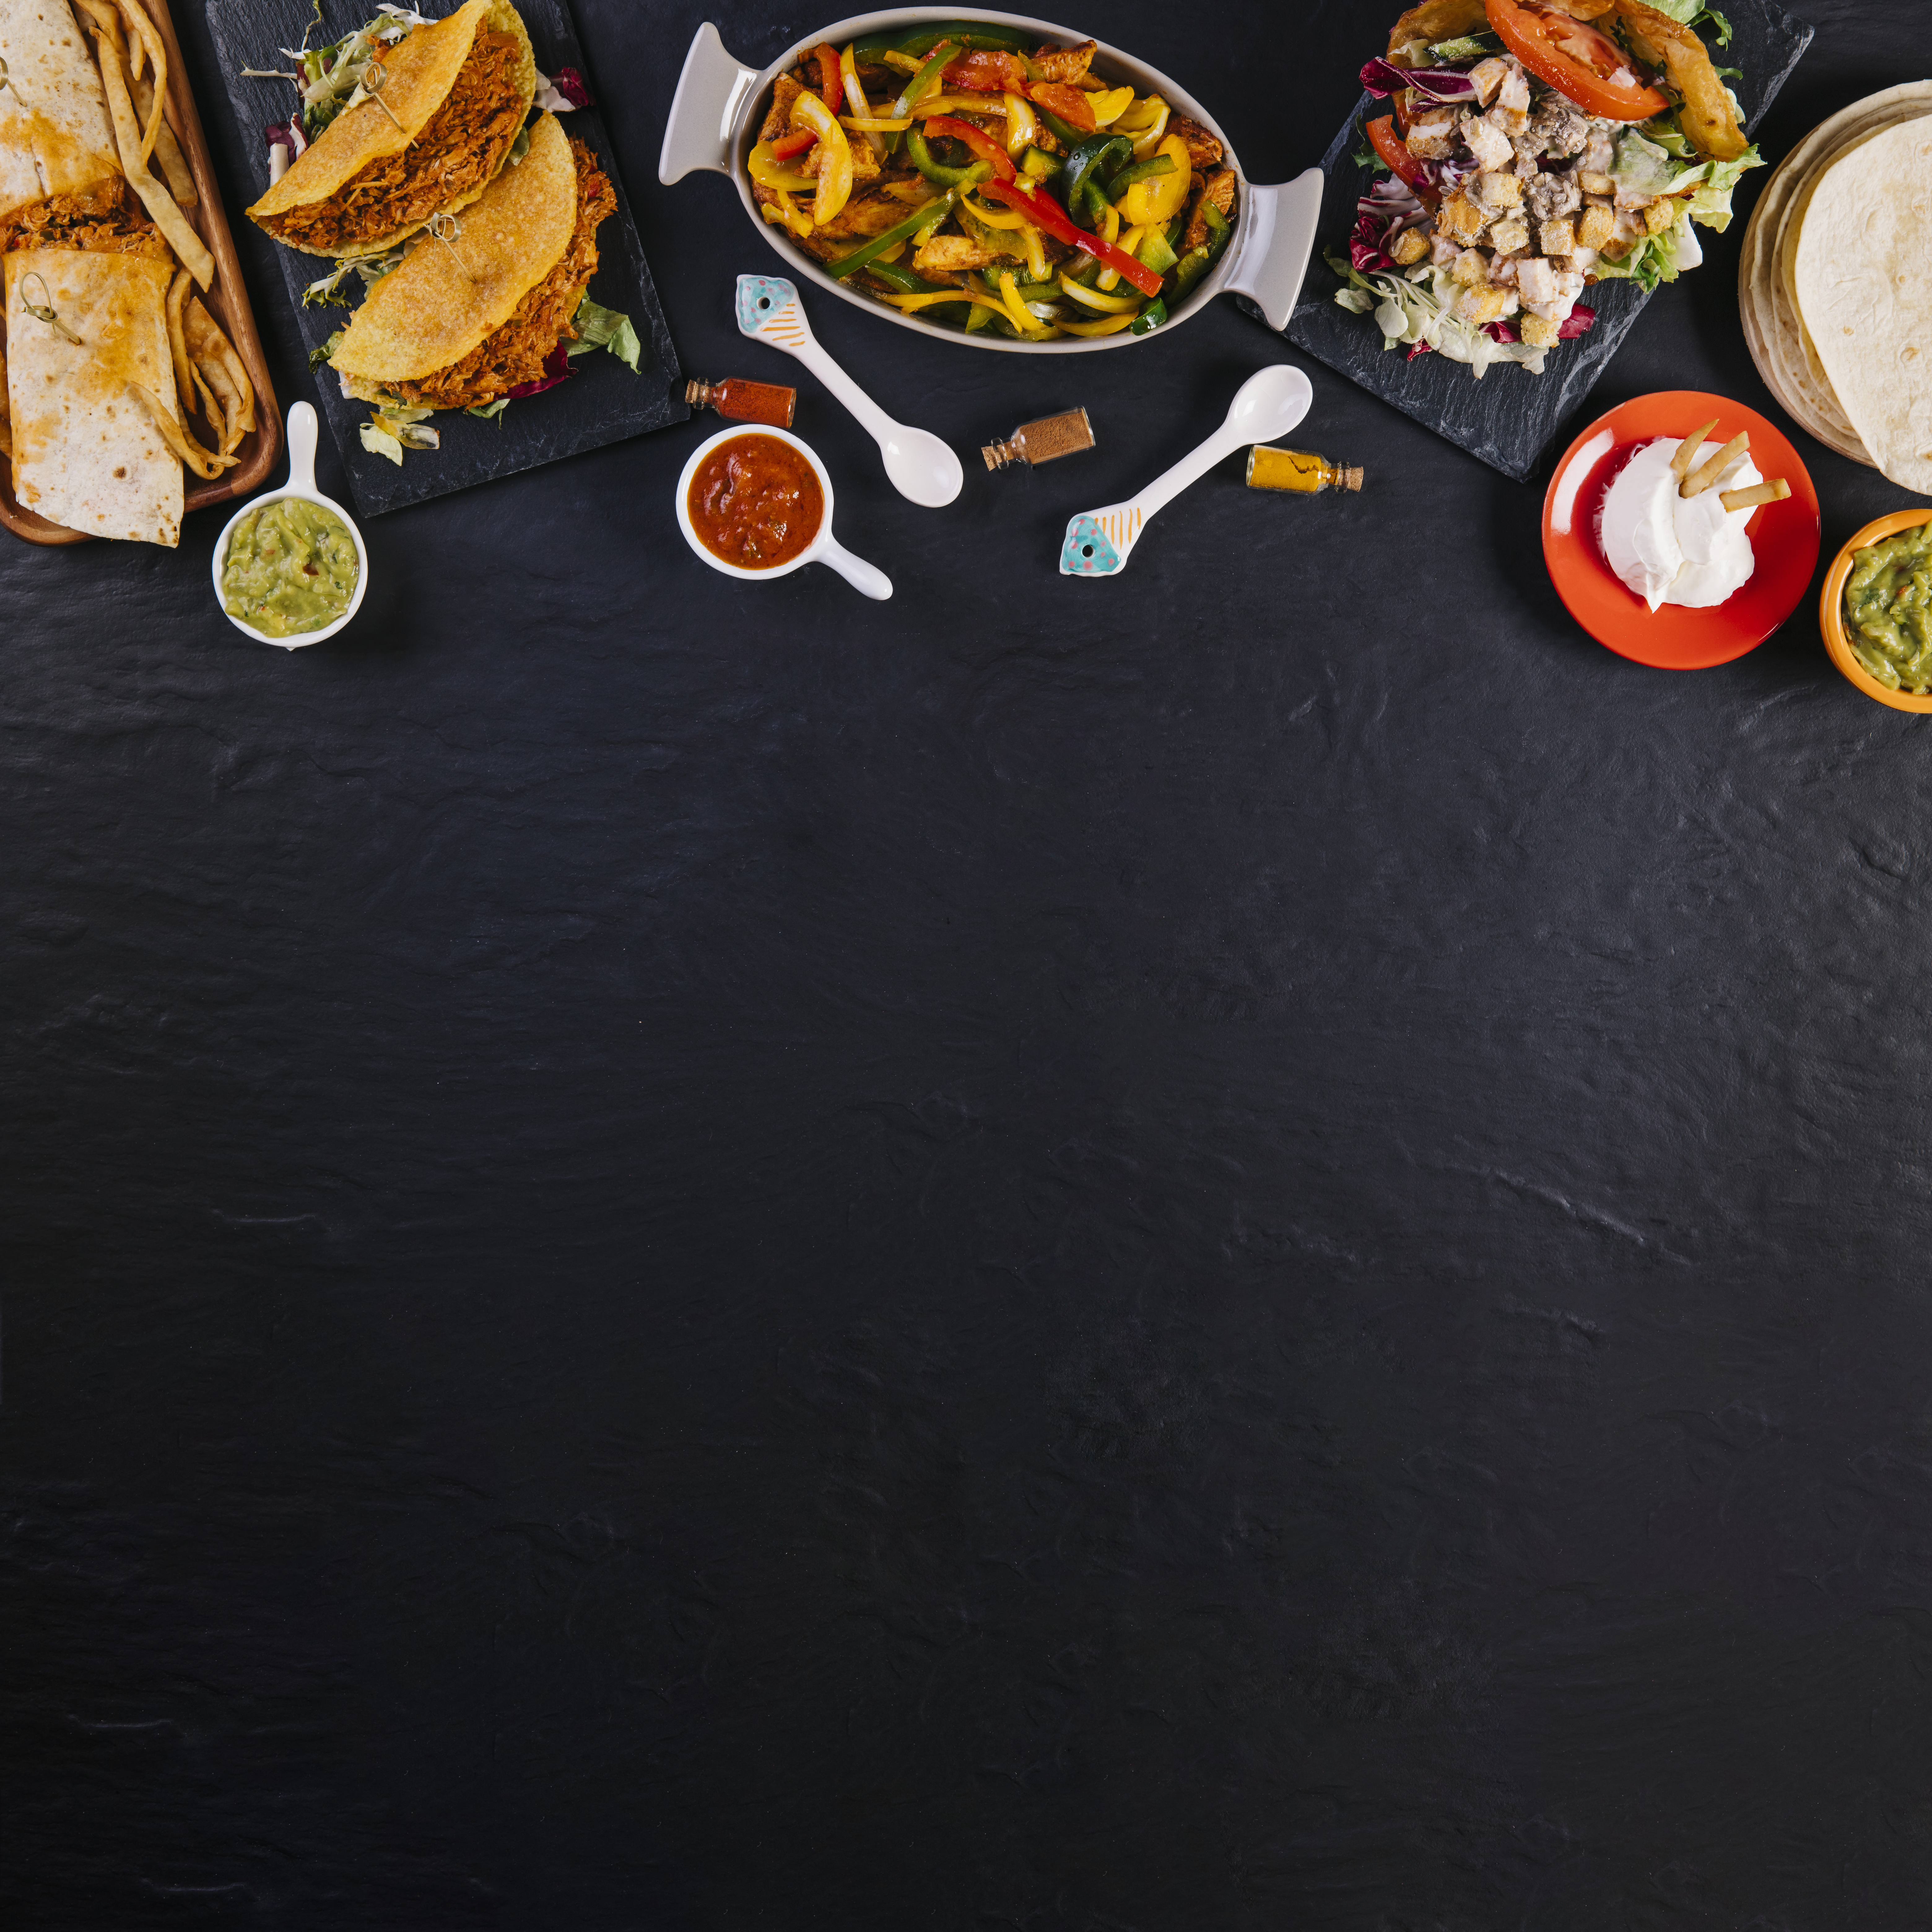 Обедно меню в Мексикански ресторант Сомбреро 2 в Пловдив